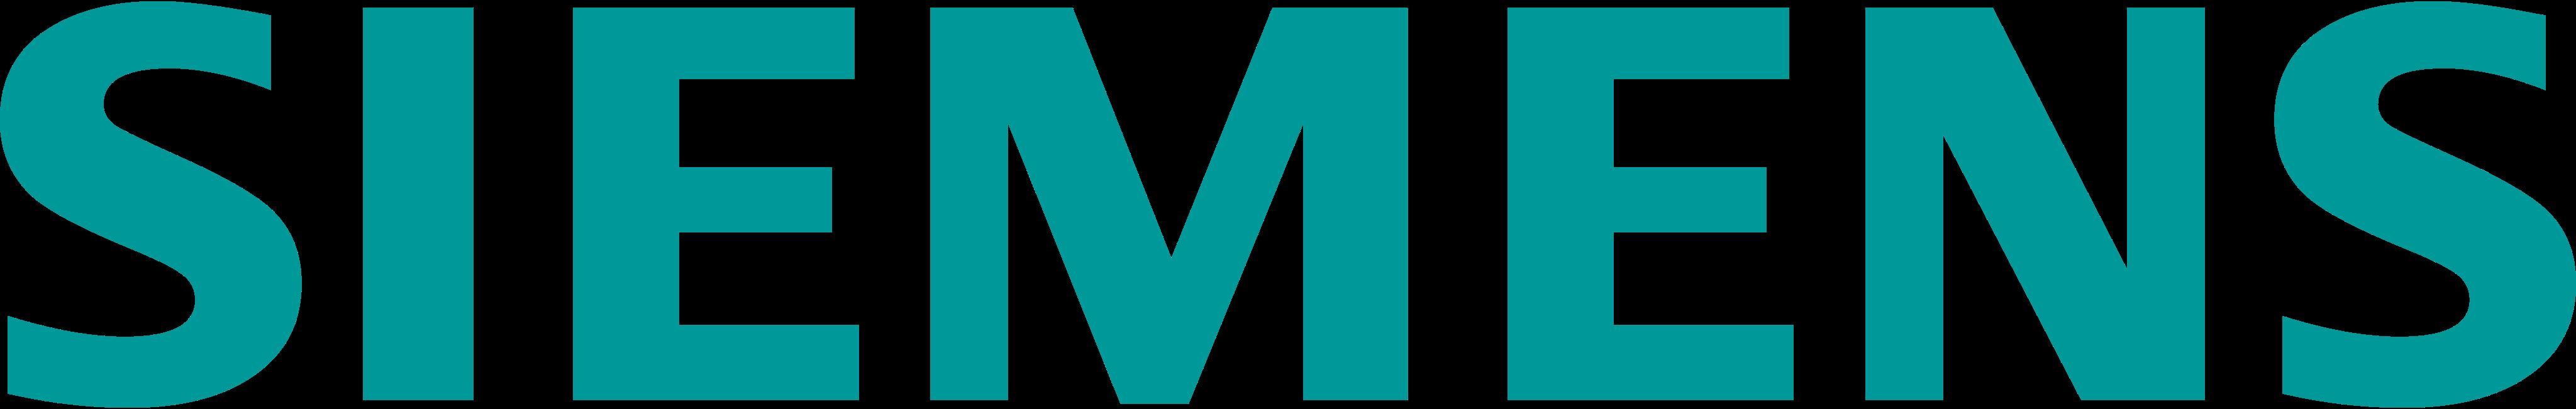 siemens logo 1 - Siemens Logo